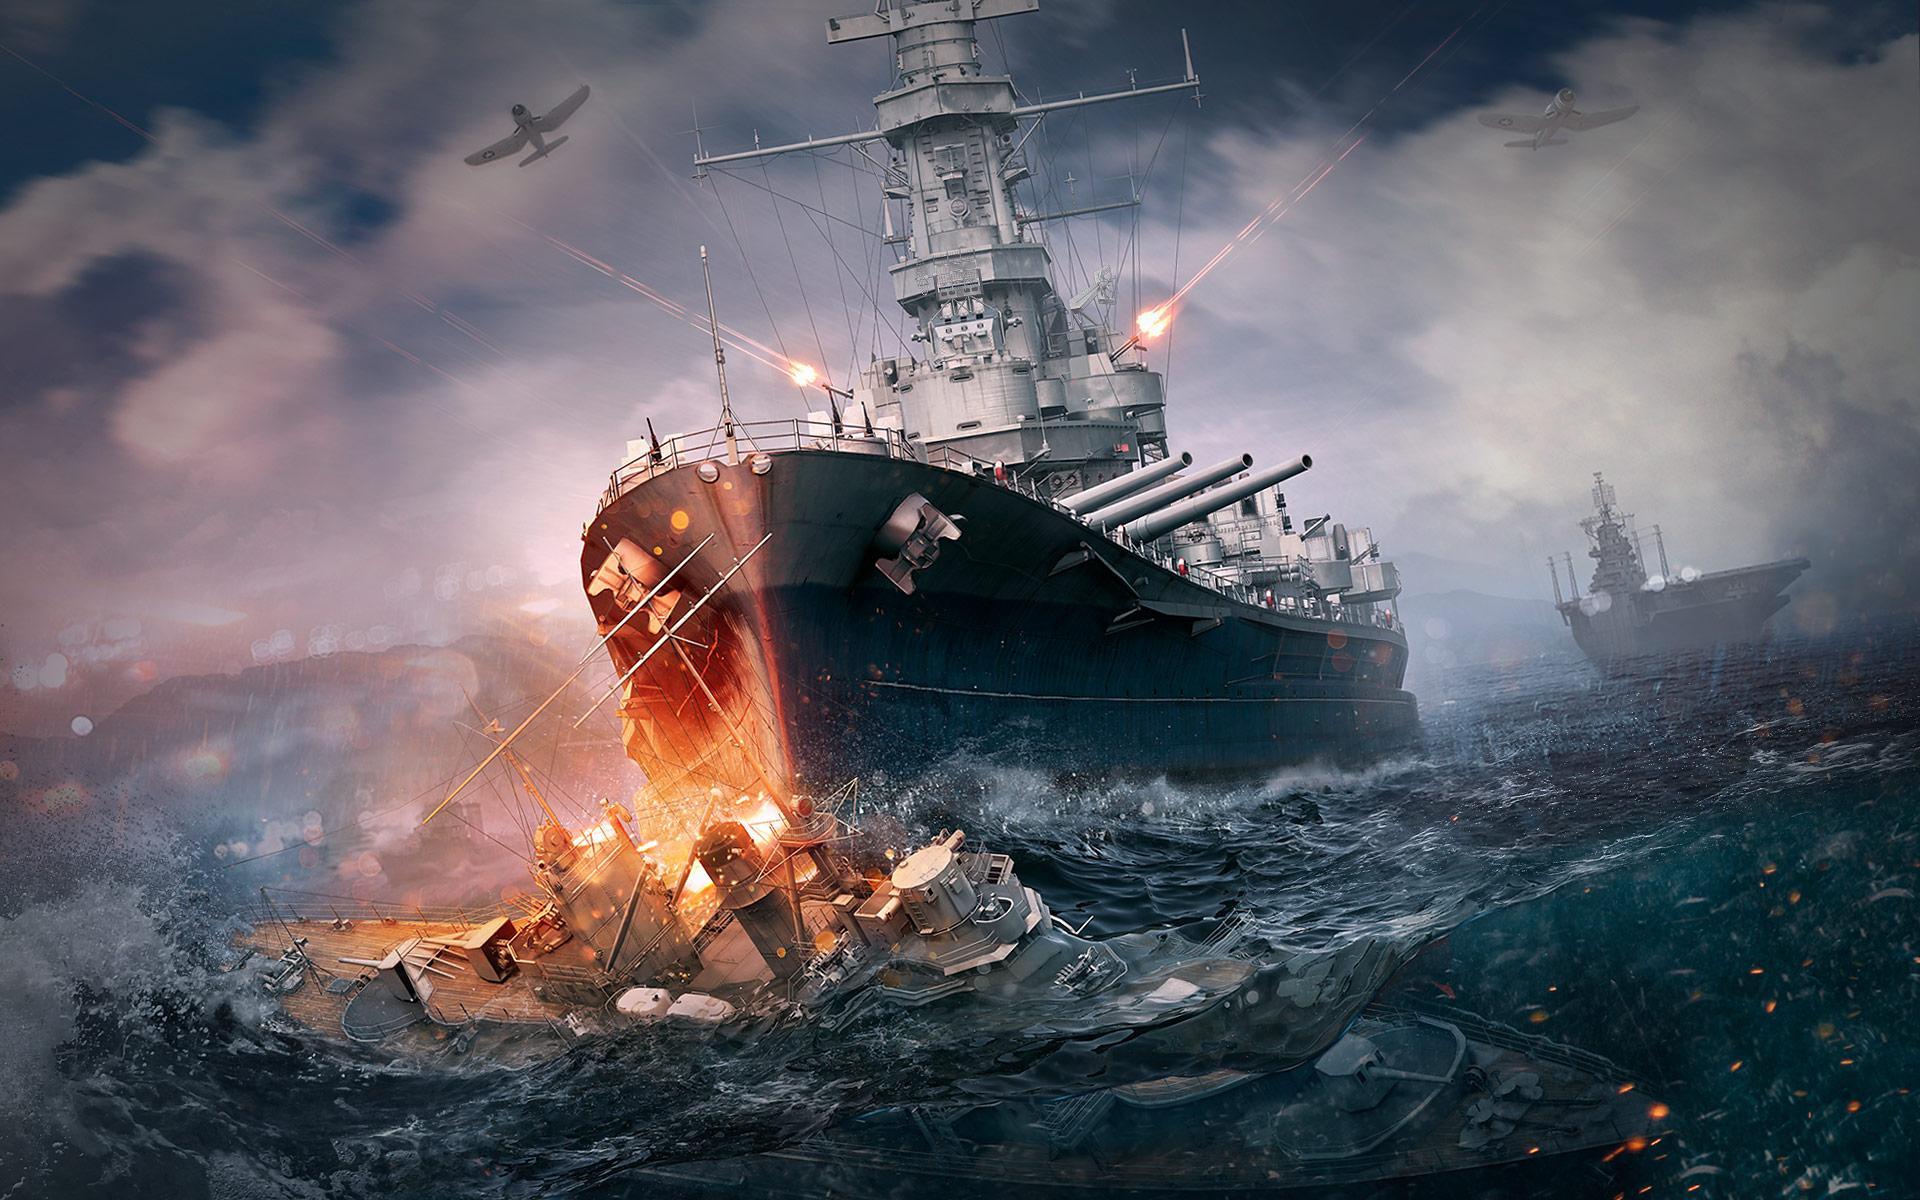 Wallpaper World Of Warships 743258 Hd Wallpaper